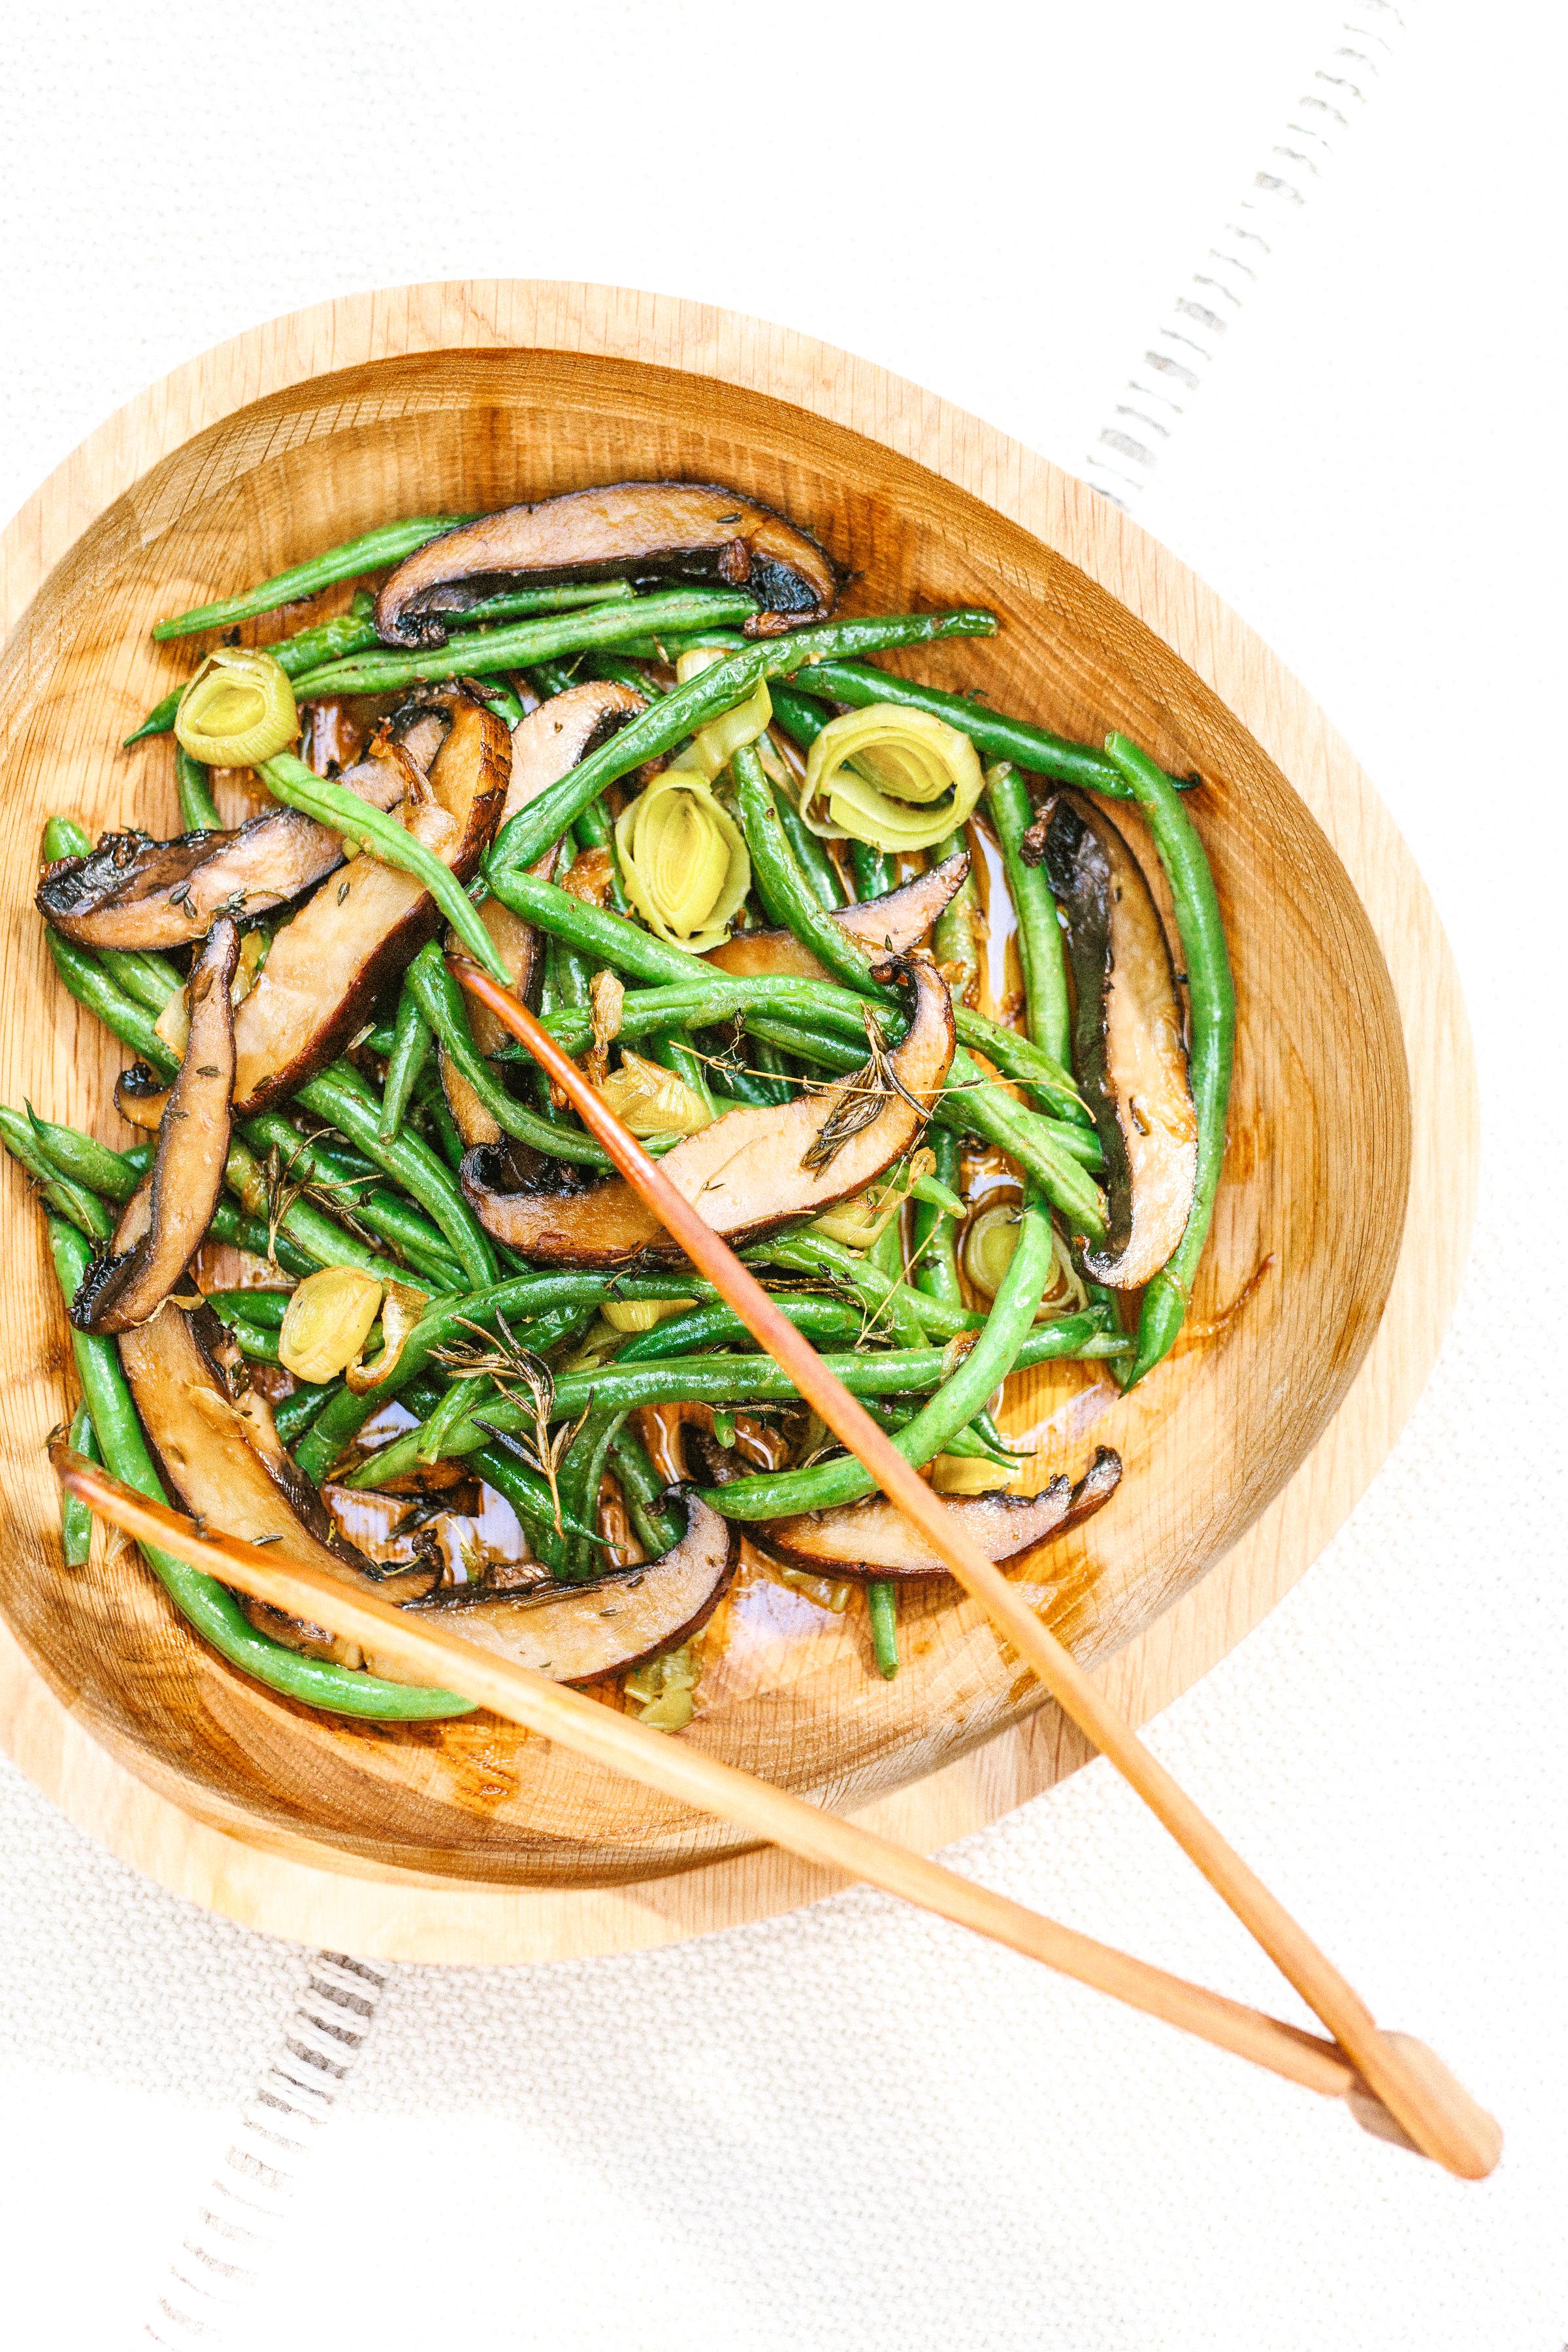 roasted fall vegetables // #ShiraRD #paleo #refinedsugarfree #SnacksbyShira